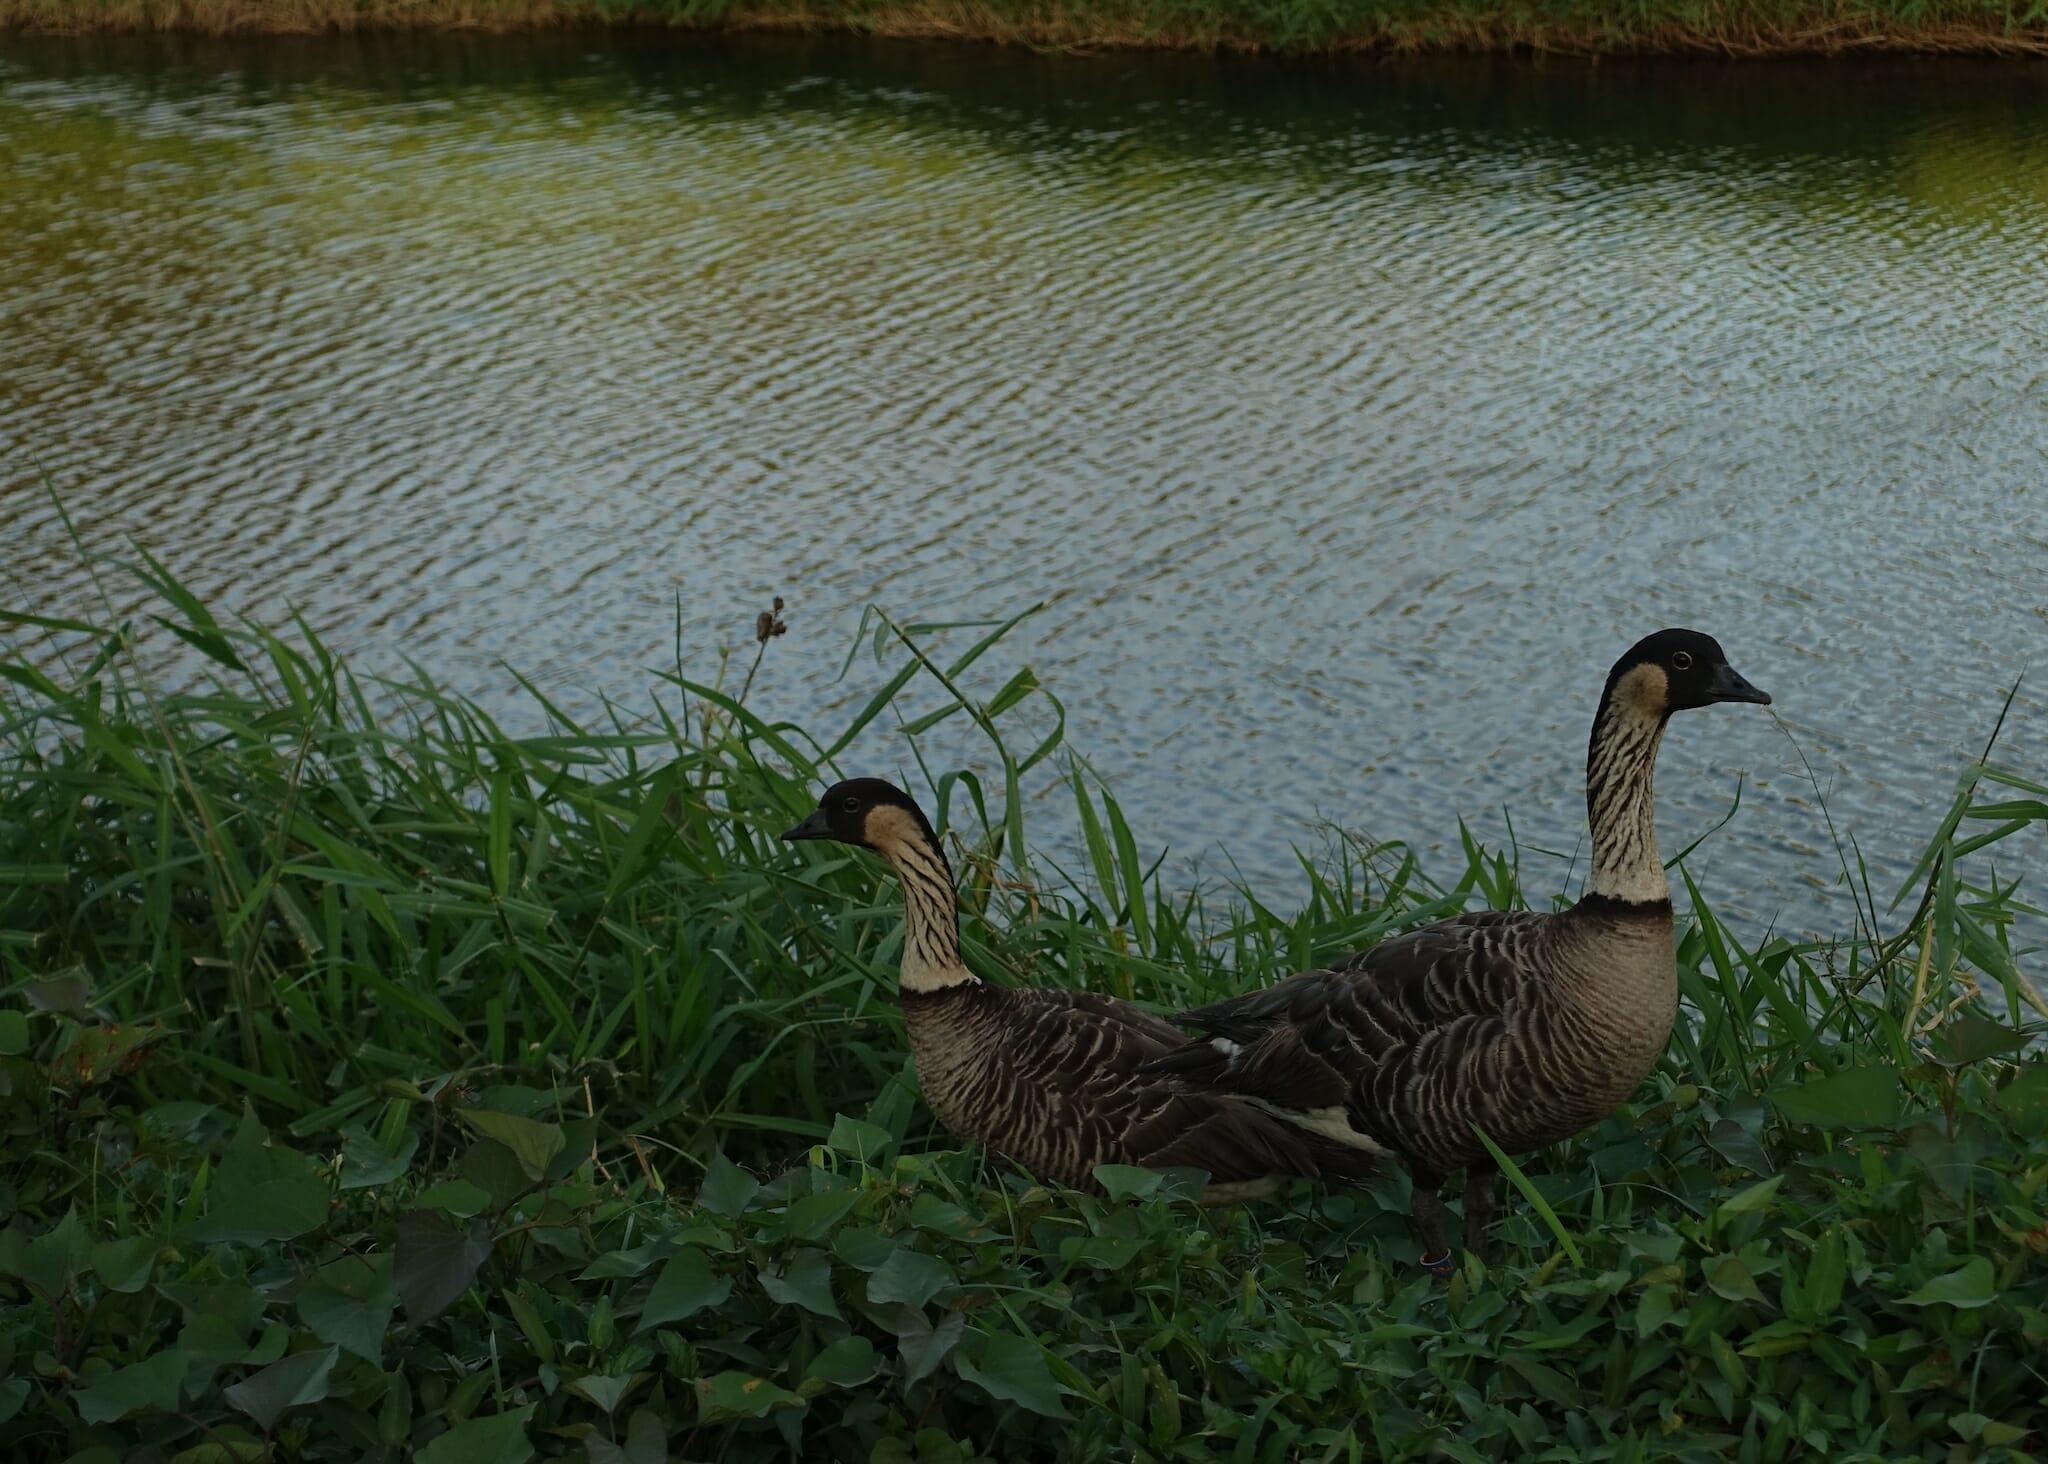 two Nēnē by the water in Hanalei National Wildlife Refuge